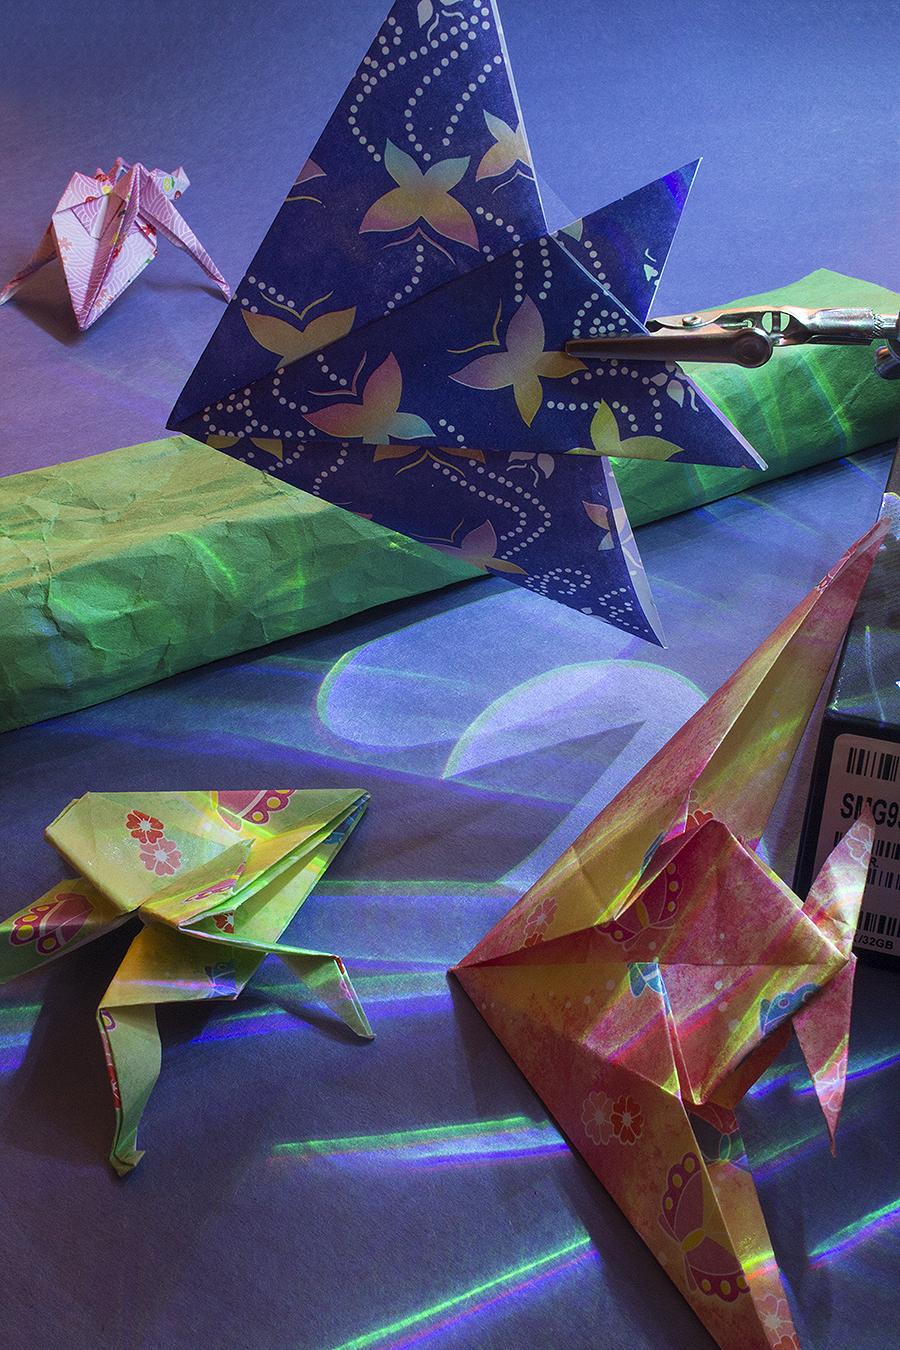 11_Sea_Jonathan_Tang_UPenn_Tony_Ward_Studio_Fish_Frogs_Long_Exposure_Low_Light_LED_Optics_Origami_Paper